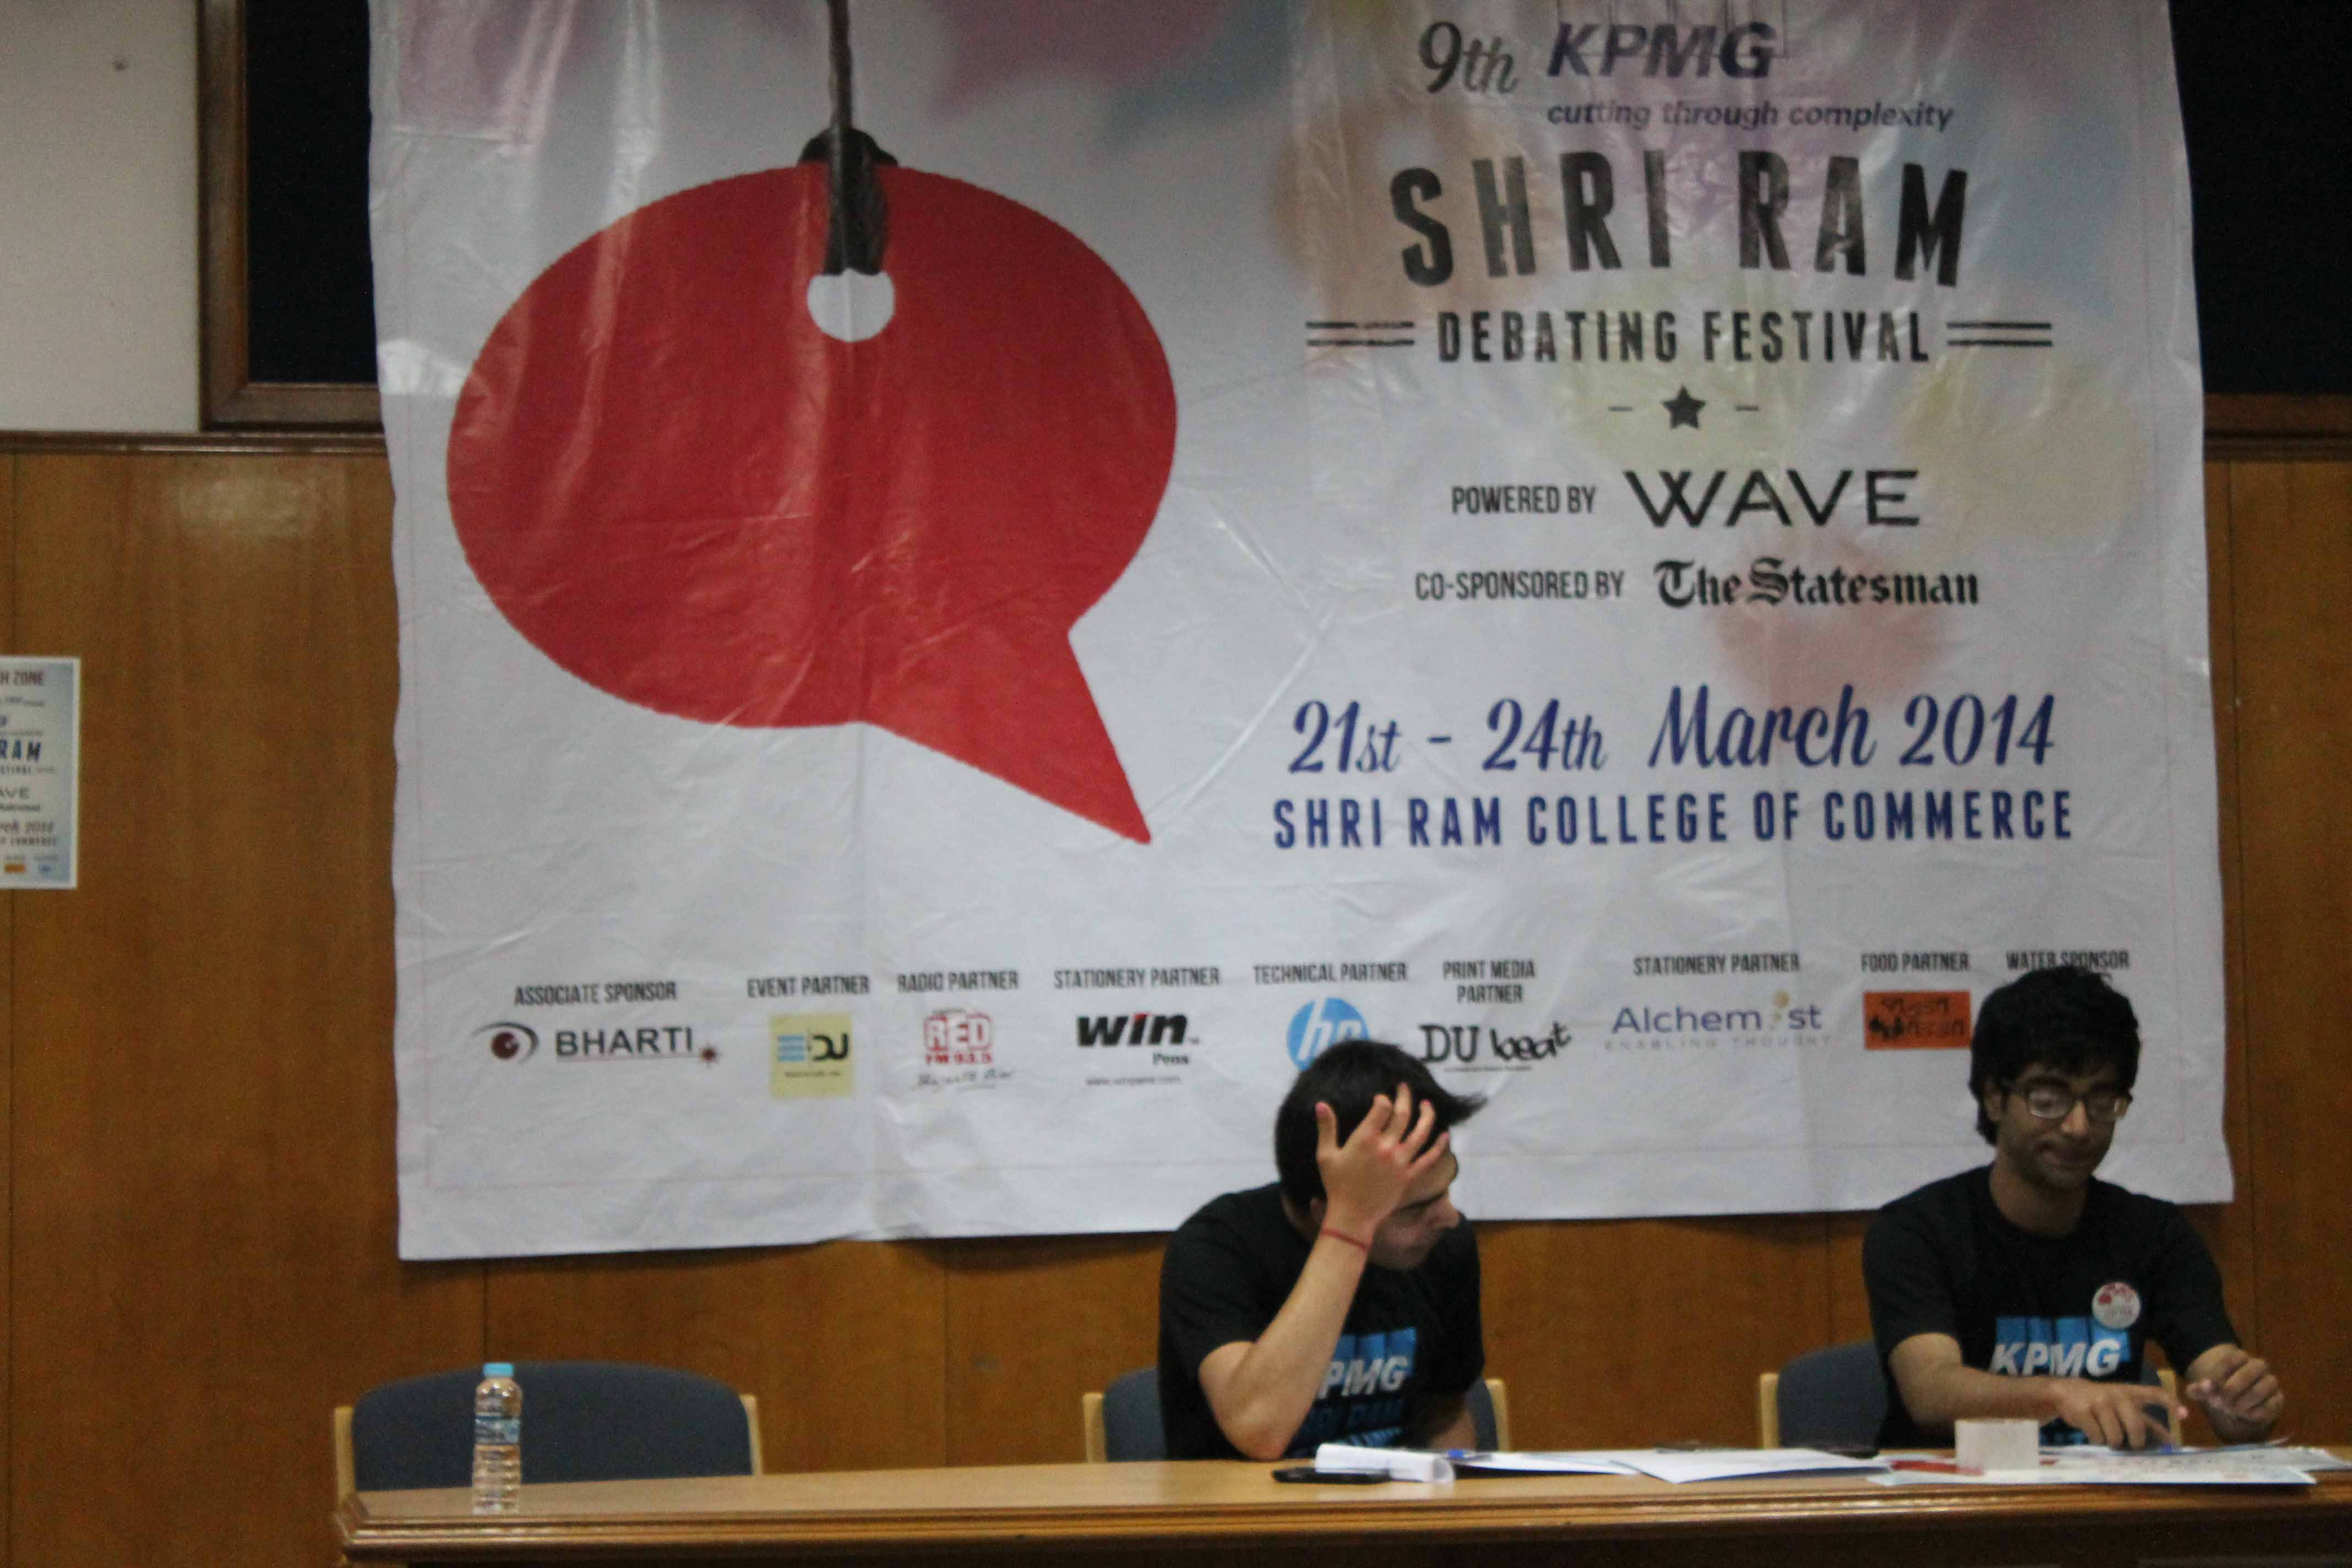 SRCC Debating Festival